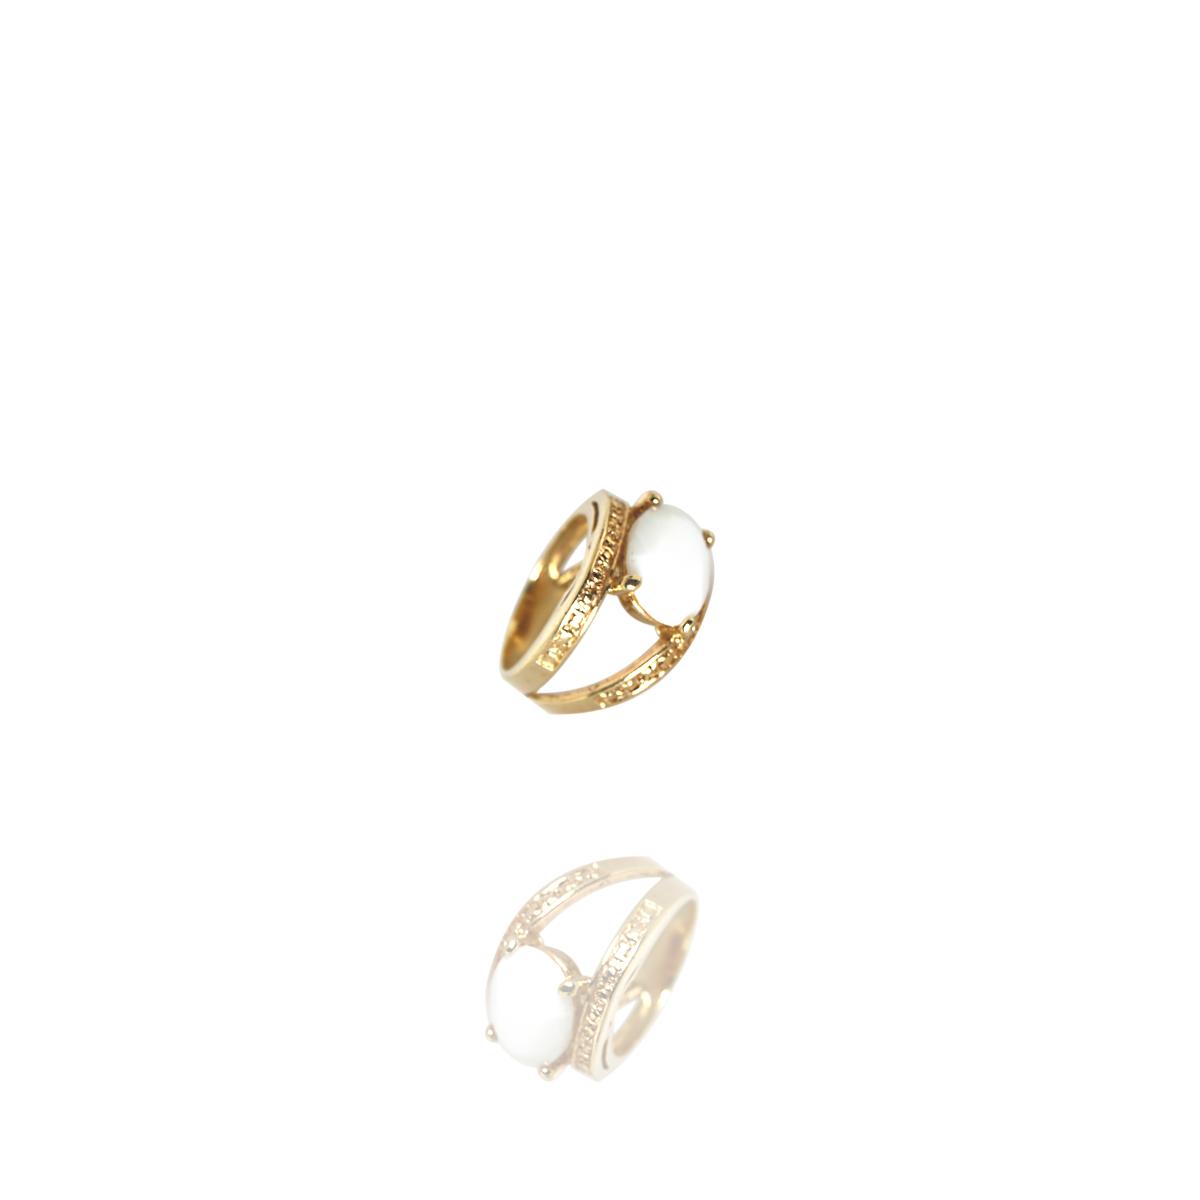 Anel Barbara Strauss Semi Joia Oval Em Quartzo Branco, Rev. Em Ouro Amarelo 18K